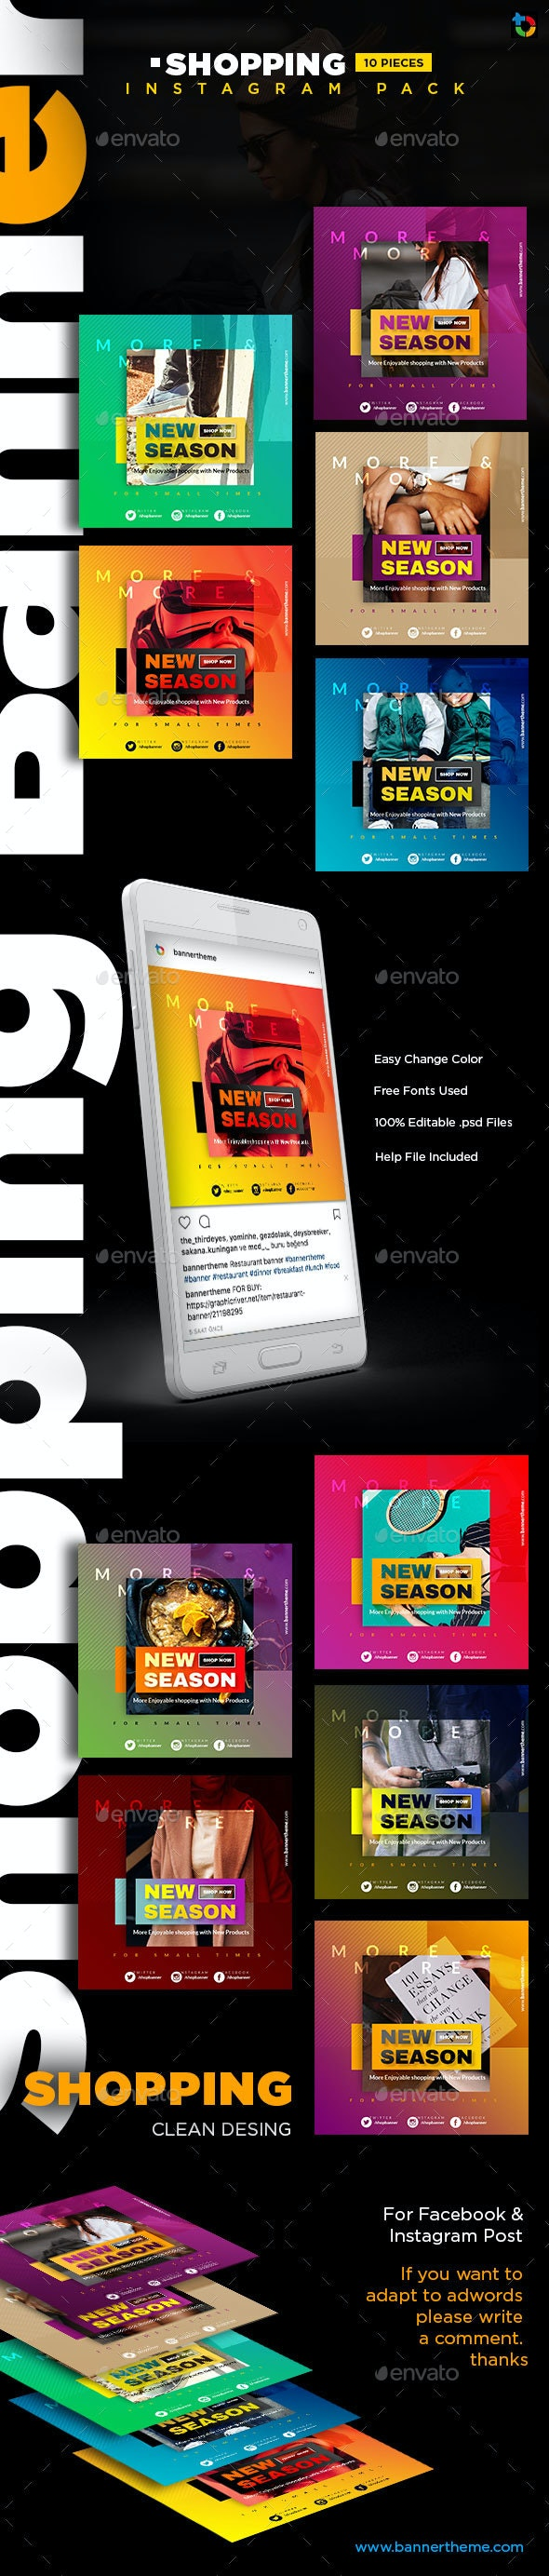 Shopping Instagram Banner - Social Media Web Elements